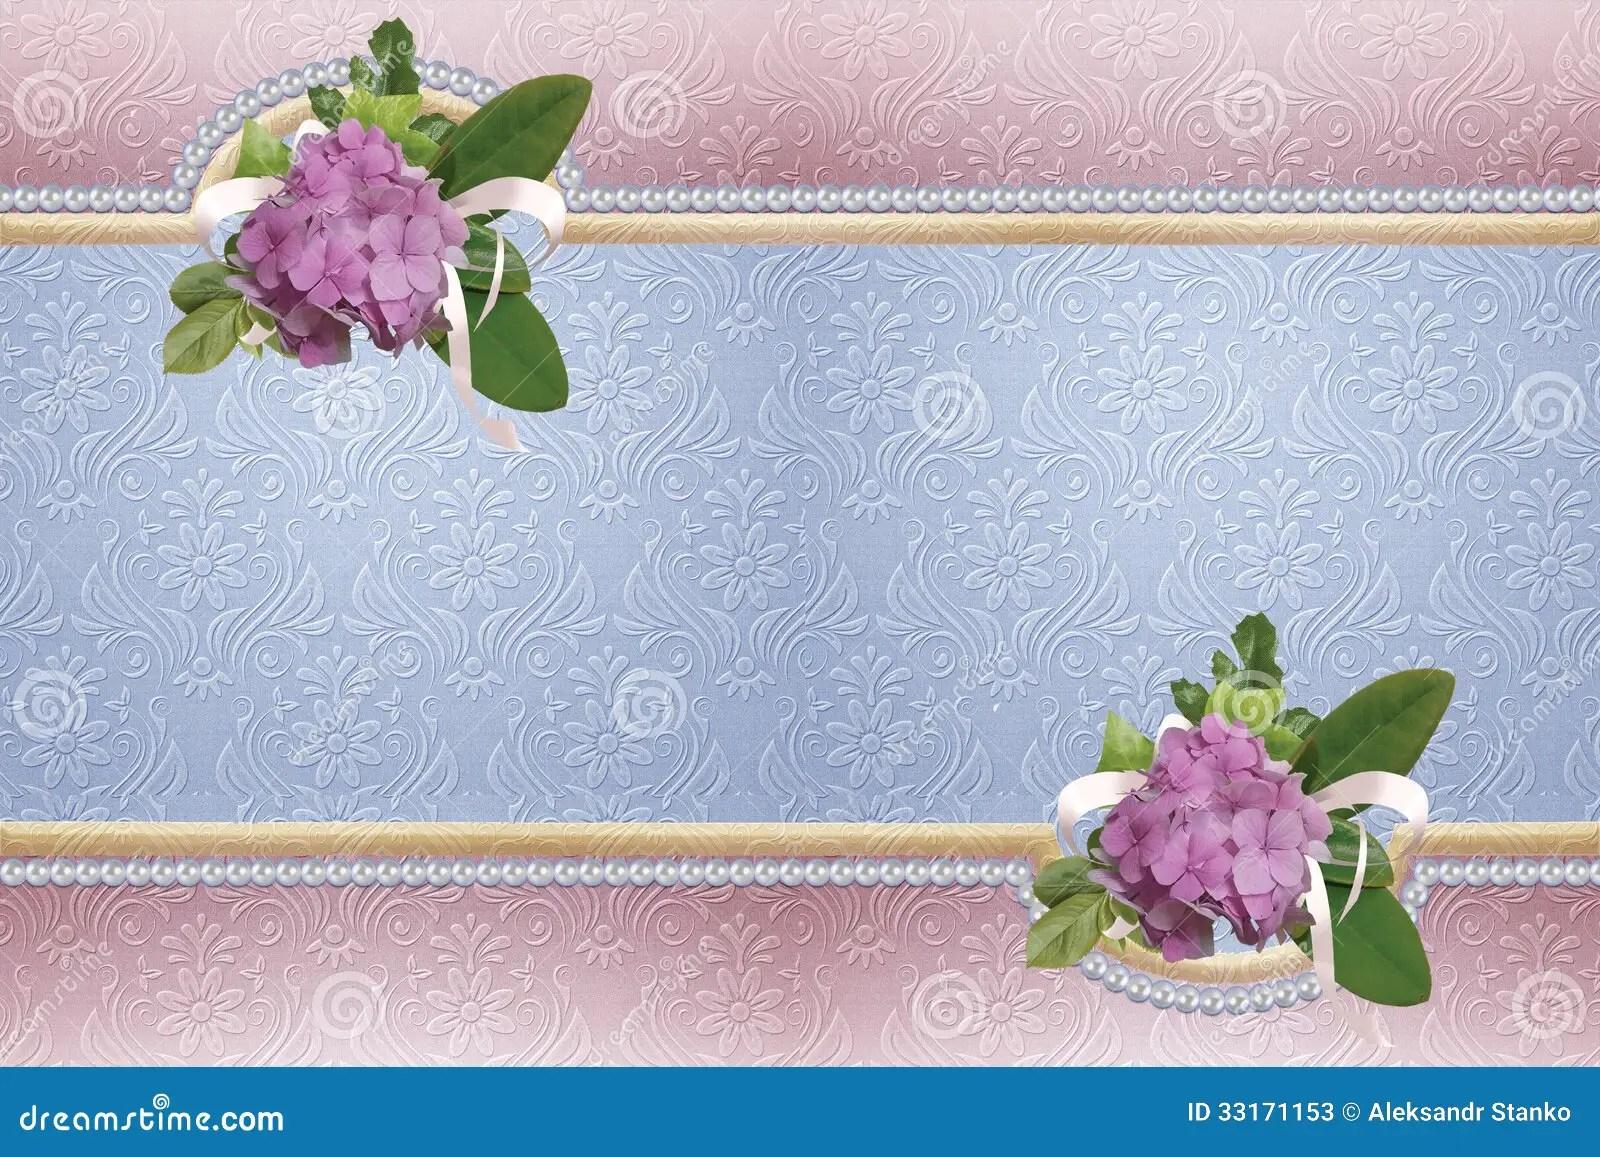 Ring Ceremony Hd Wallpaper Elegant Wedding Backgrounds Stock Photos Image 33171153